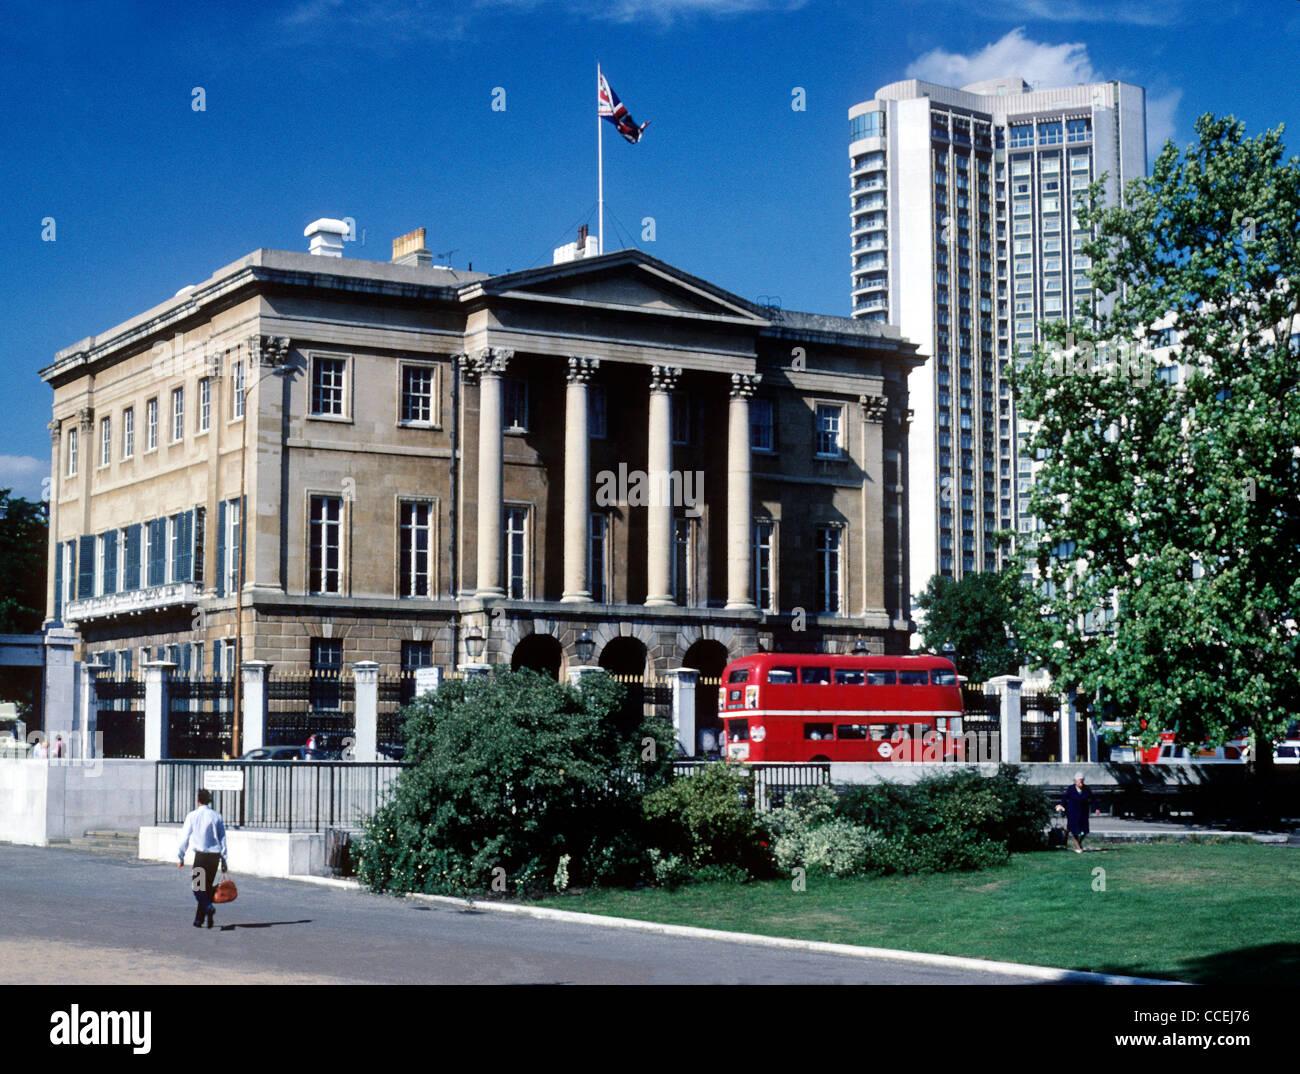 Apsley House, No.1 Piccadilly, Hyde Park Corner, home of 1st Duke of Wellington The Iron Duke London England UK - Stock Image